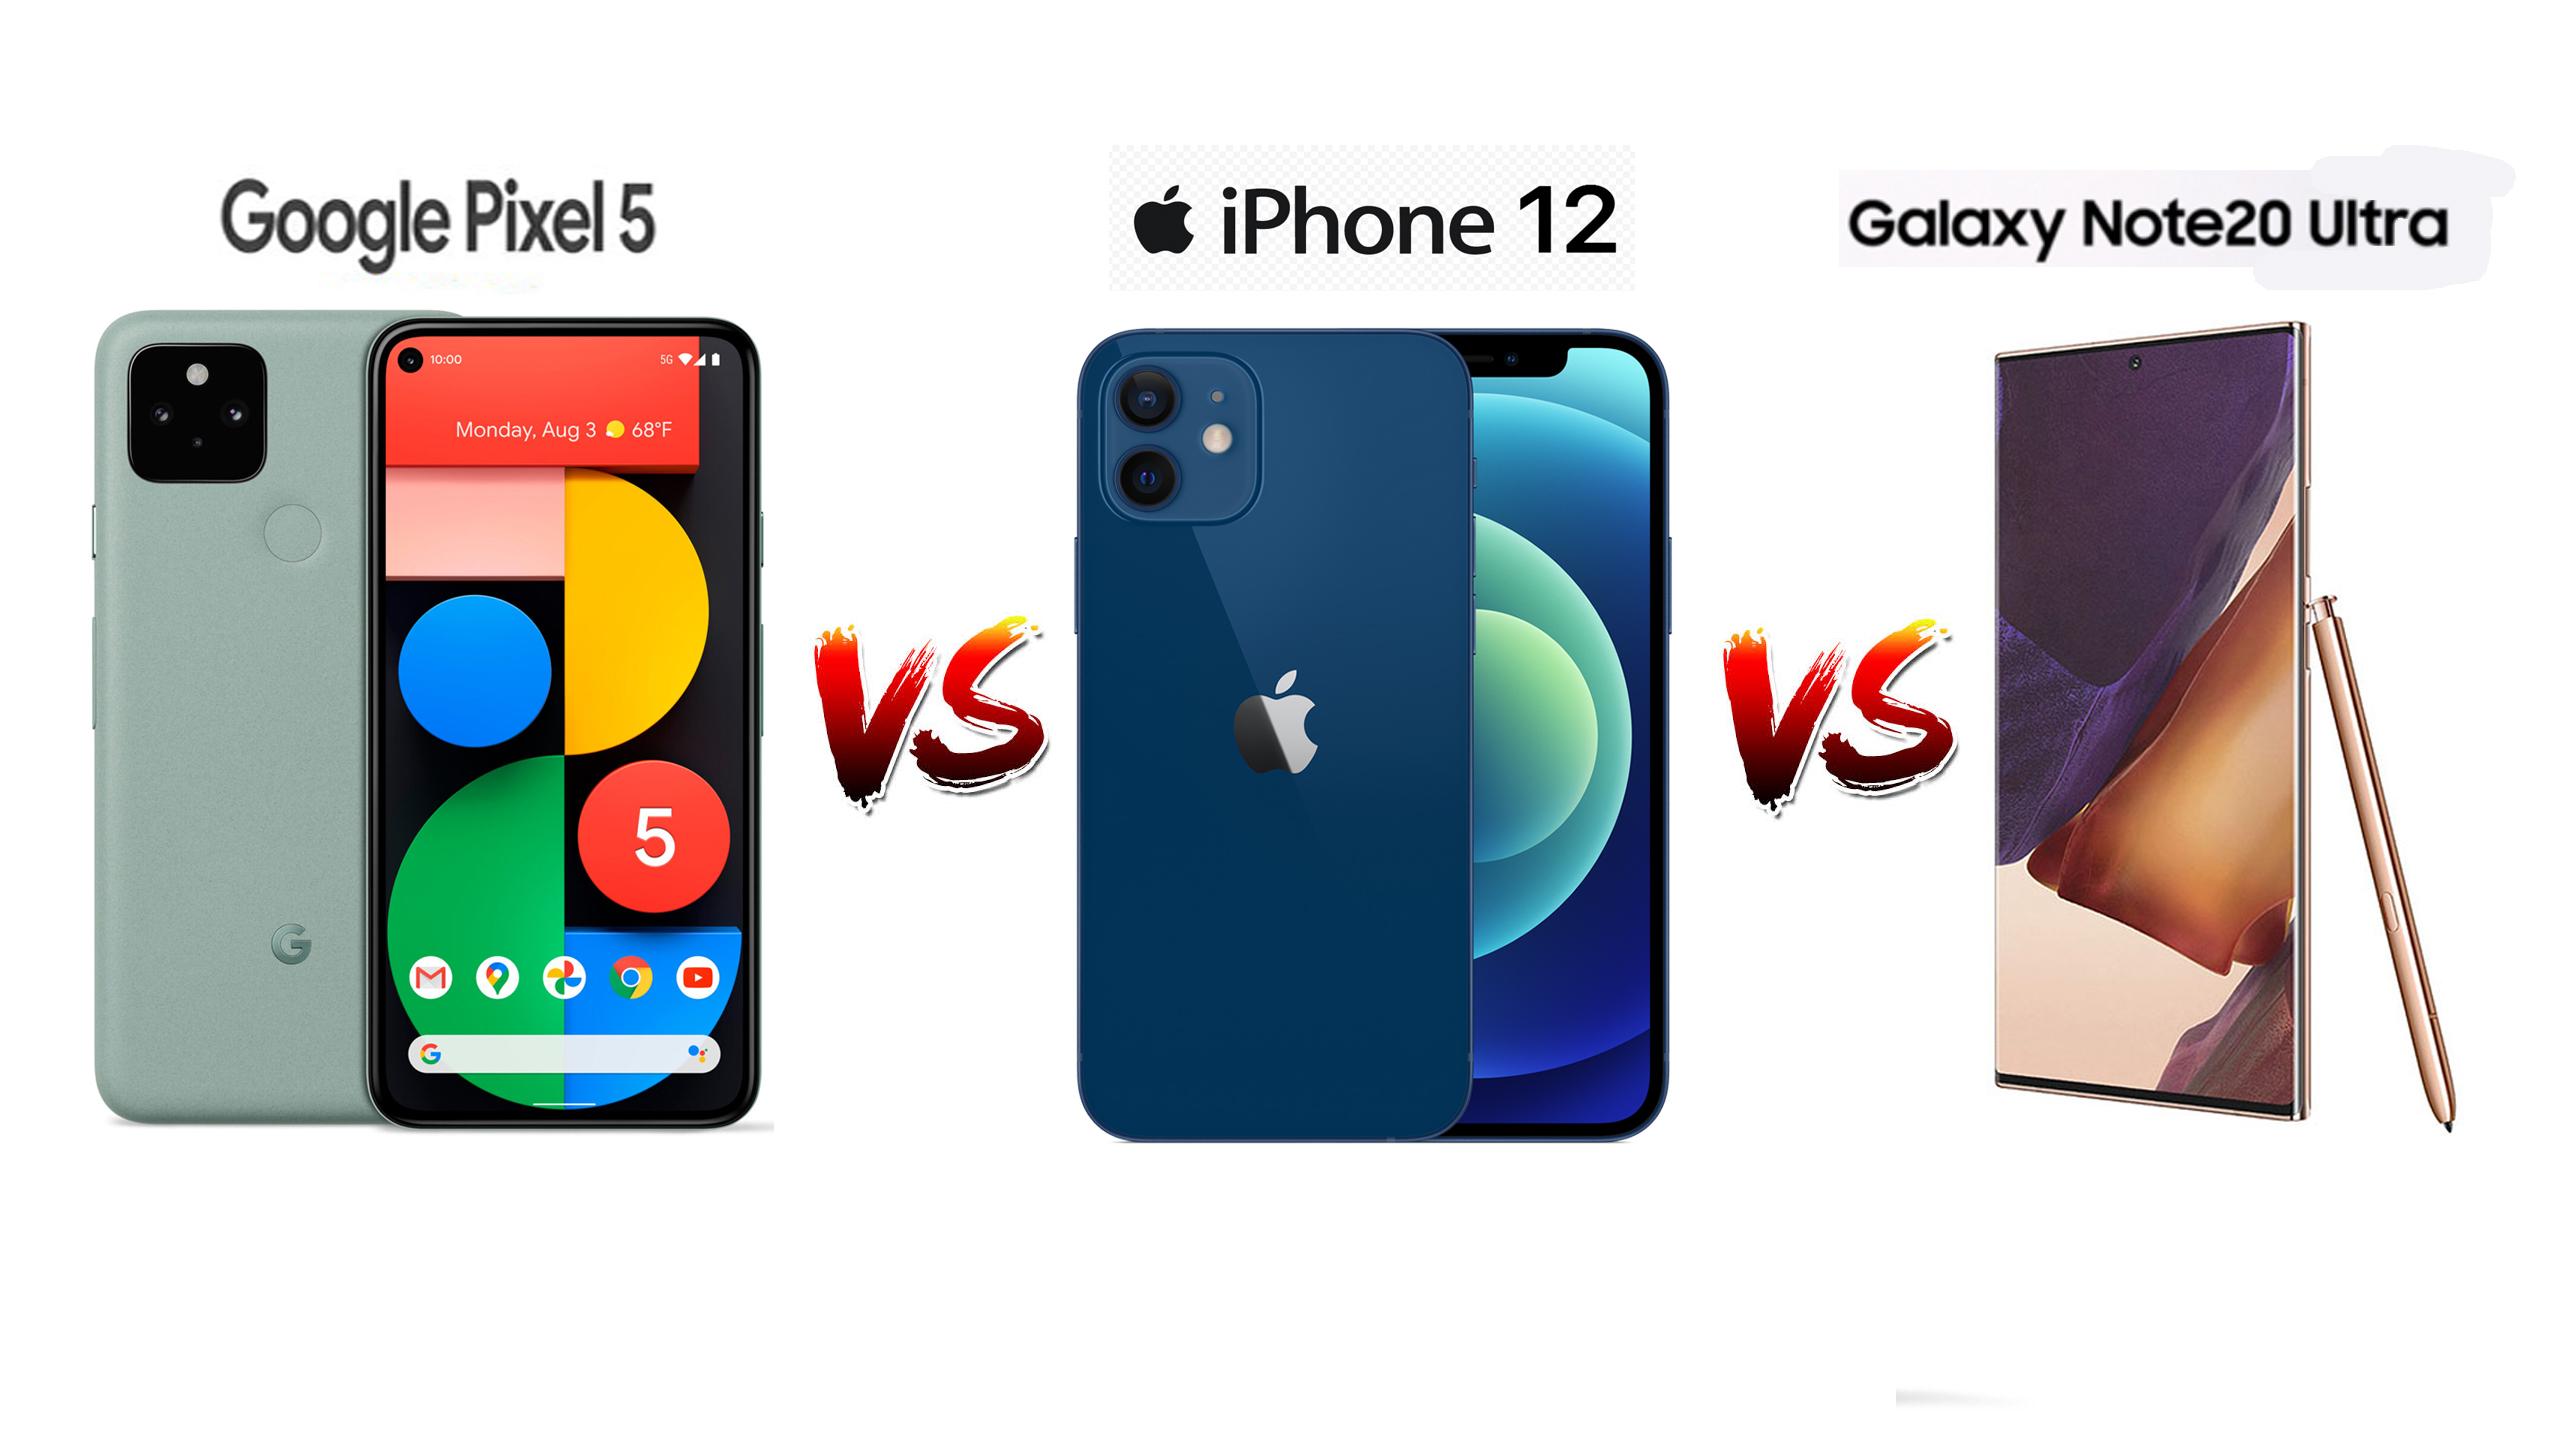 pixel 5 vs iphone 12 vs note 20 ultra